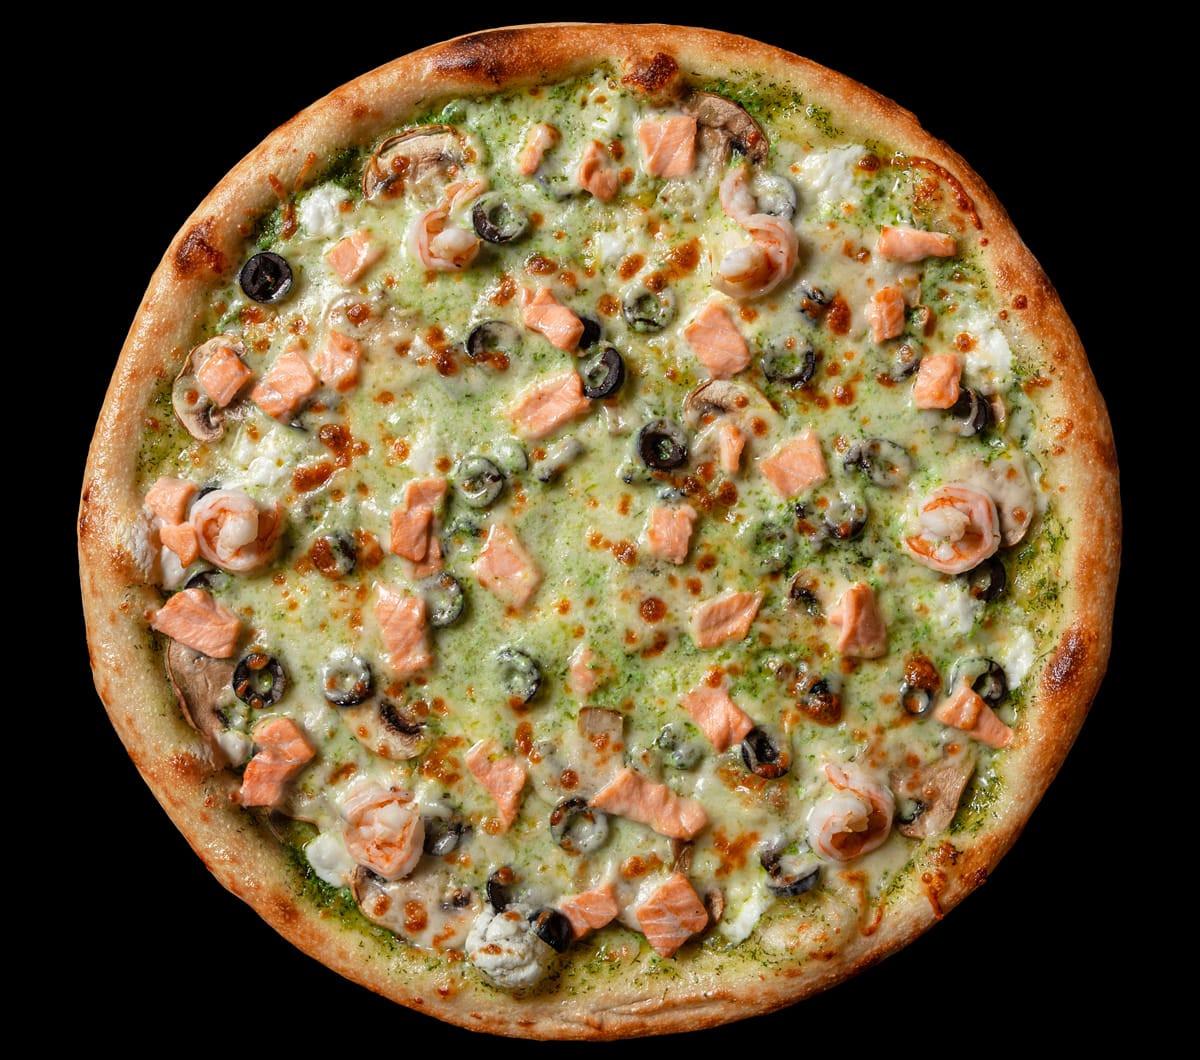 заказать:(uk) Піца - Монро